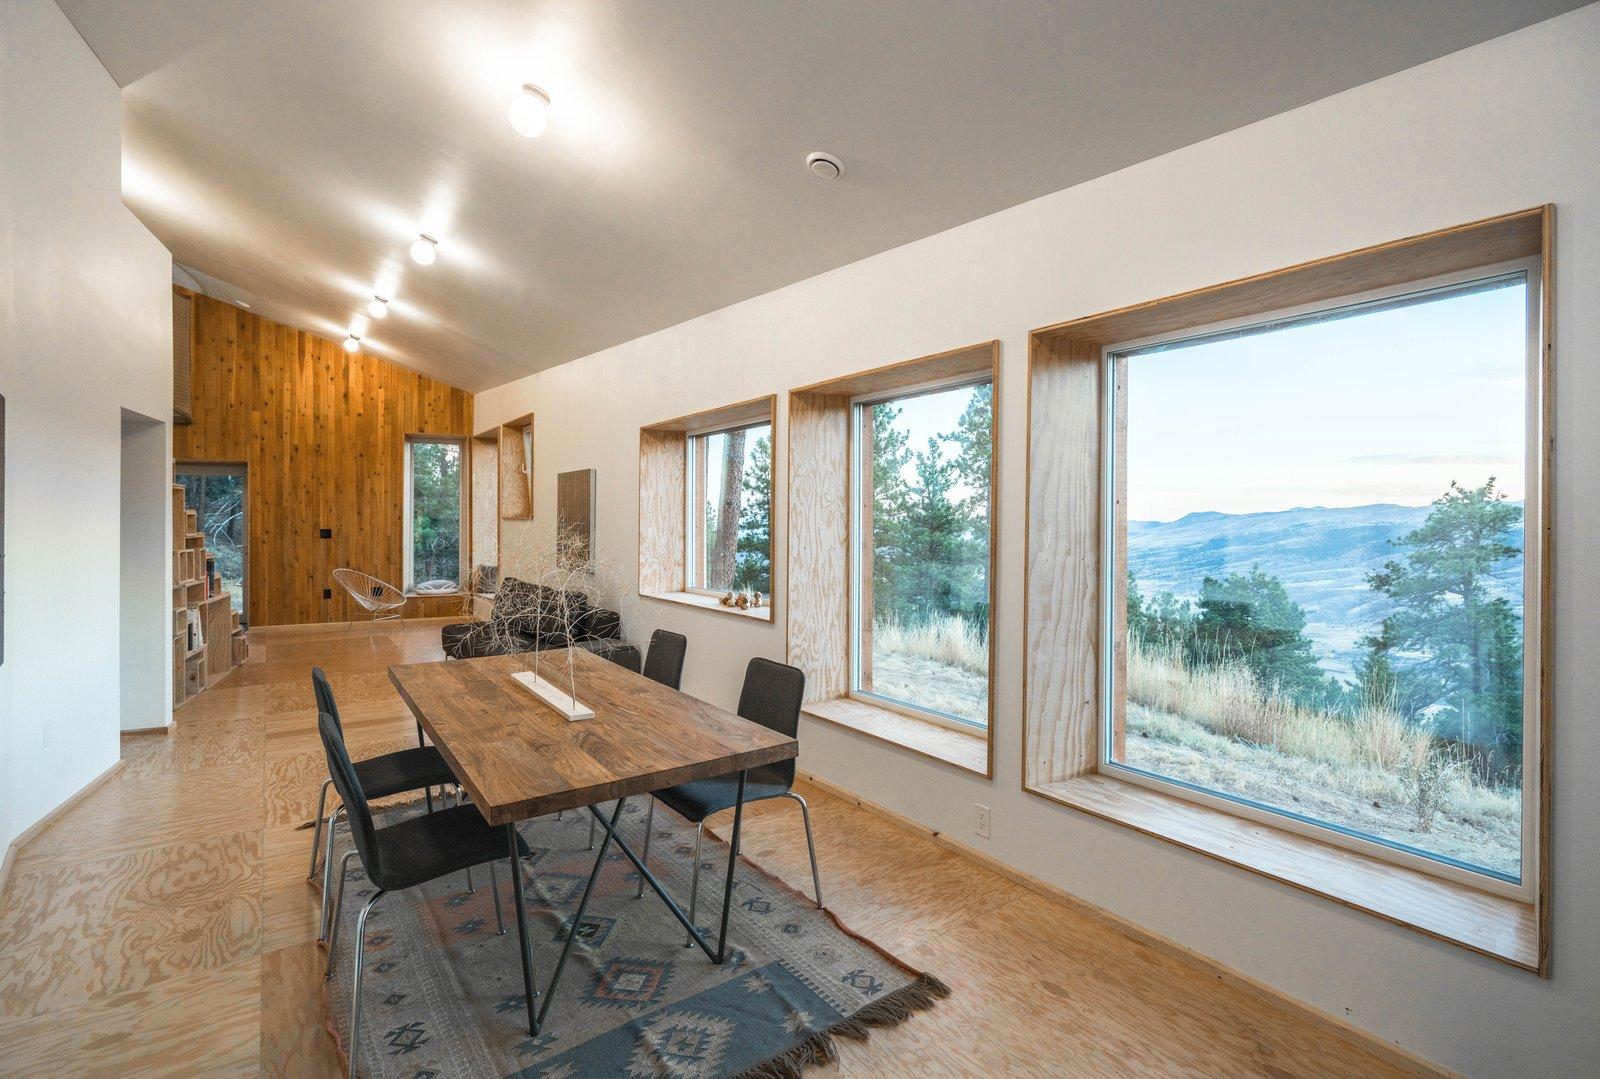 Living Room, Light Hardwood Floor, Table, Chair, and Ceiling Lighting  MARTaK Passive House